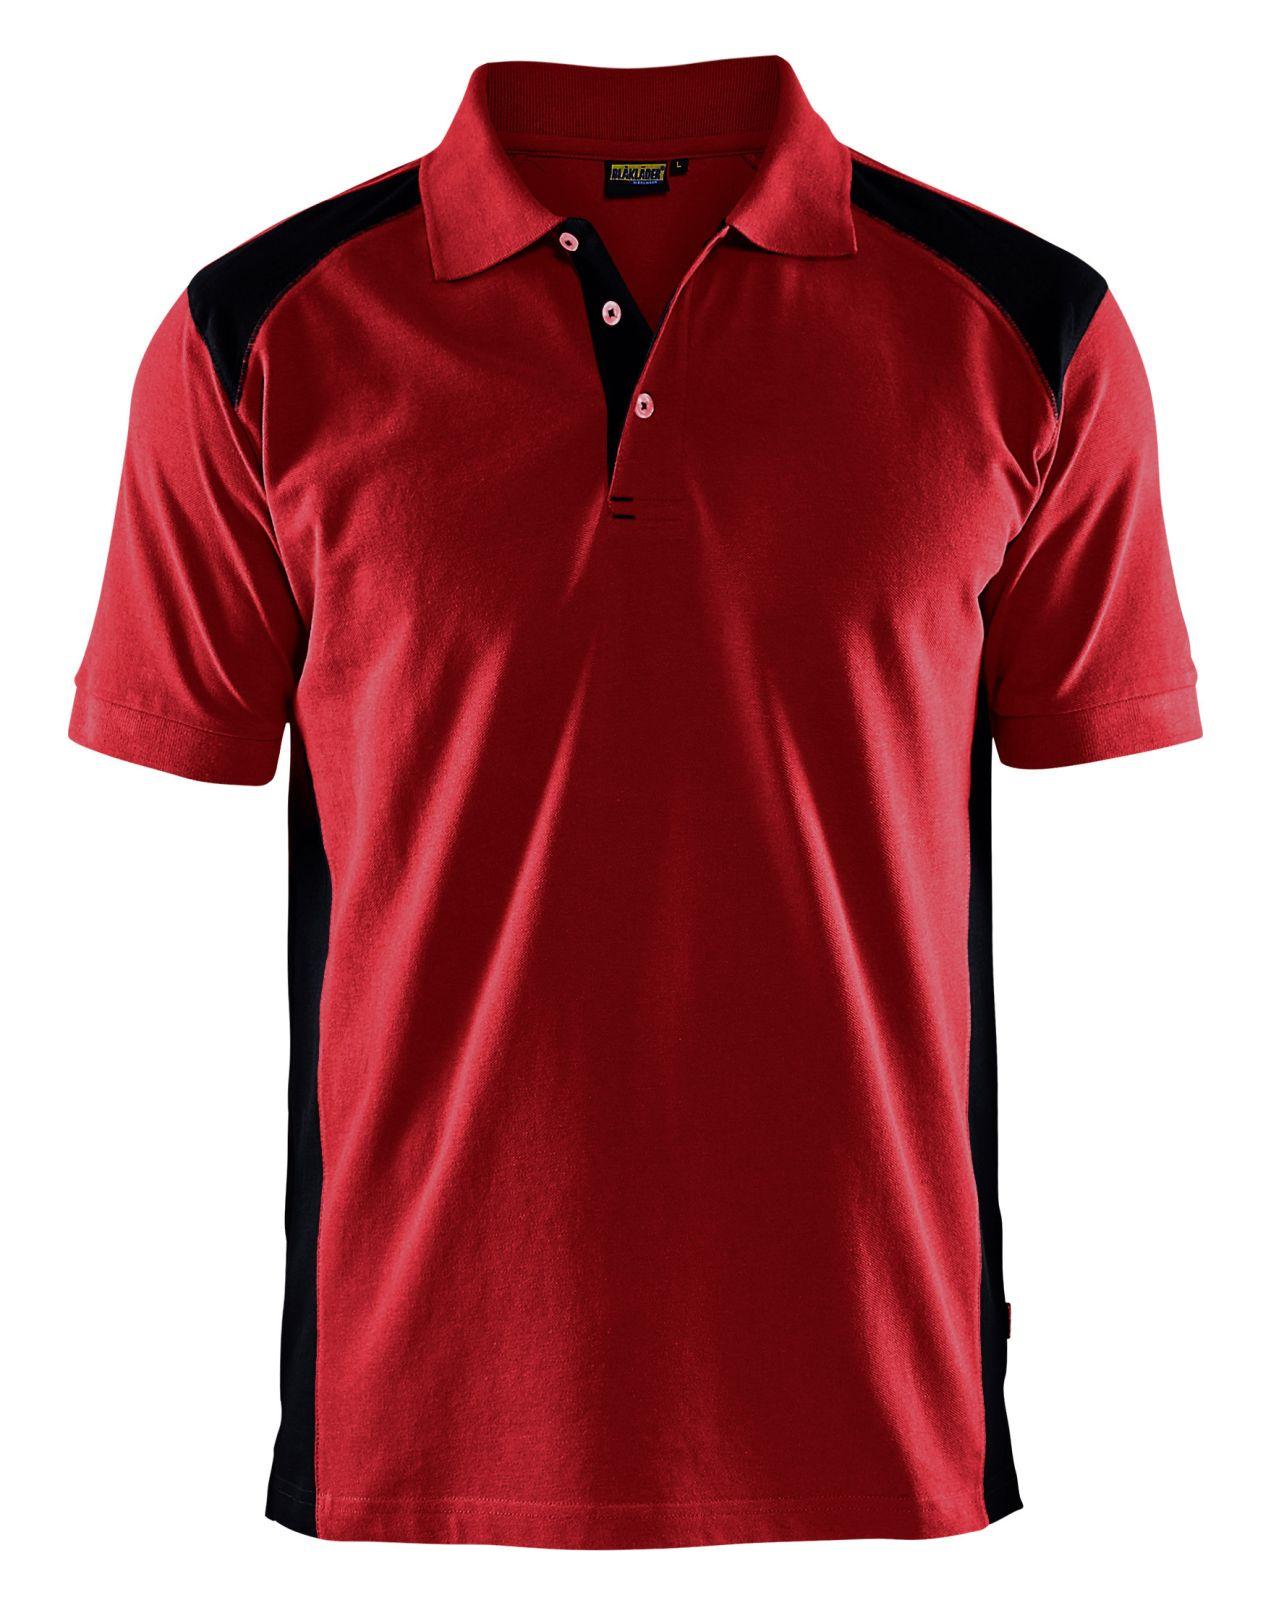 Blaklader Polo shirts 33241050 rood-zwart(5699)